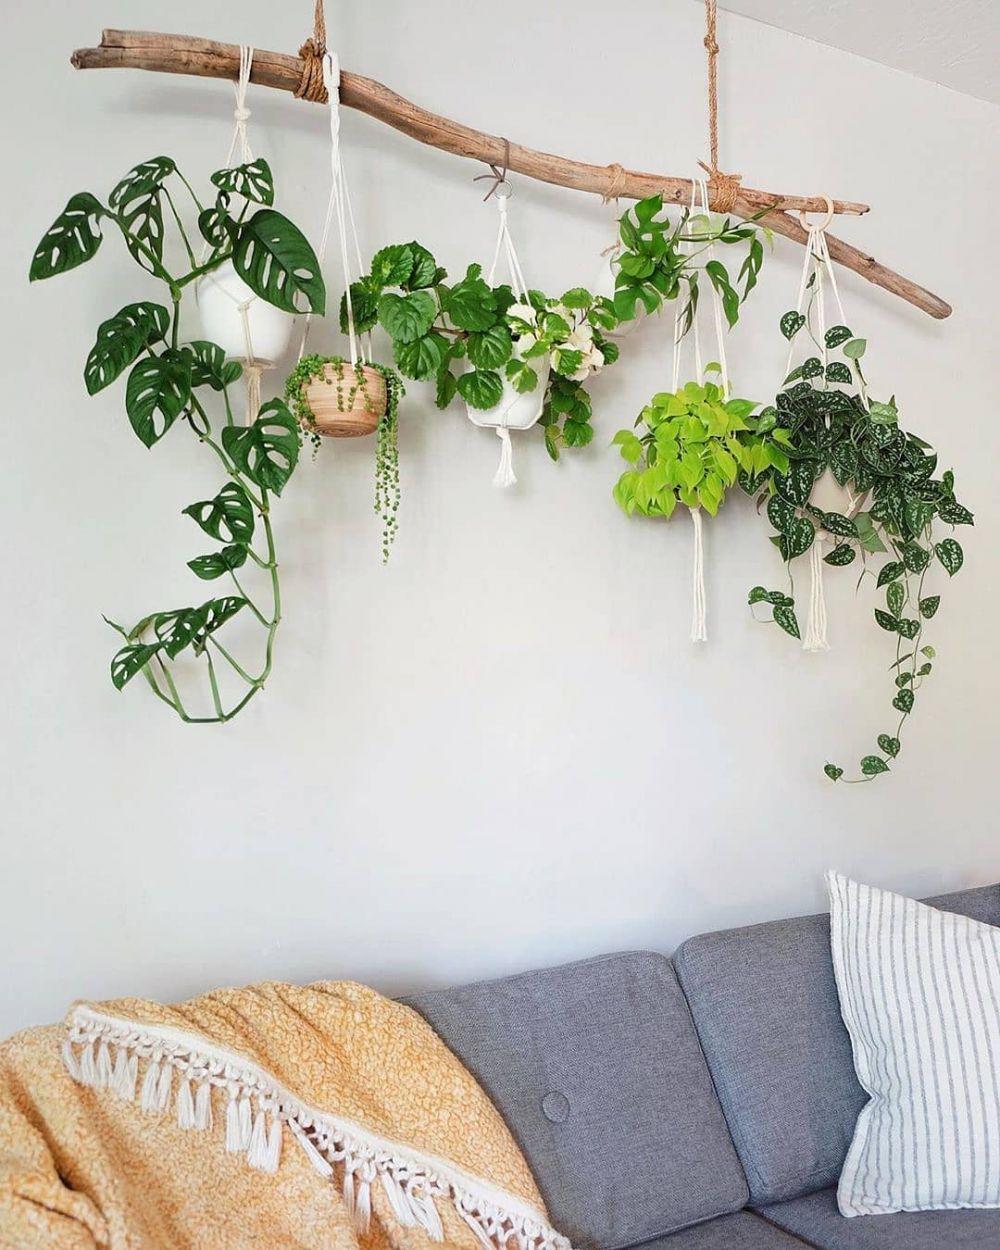 Cara menata tanaman hias gantung untuk percantik taman Instagram © 2021 brilio.net